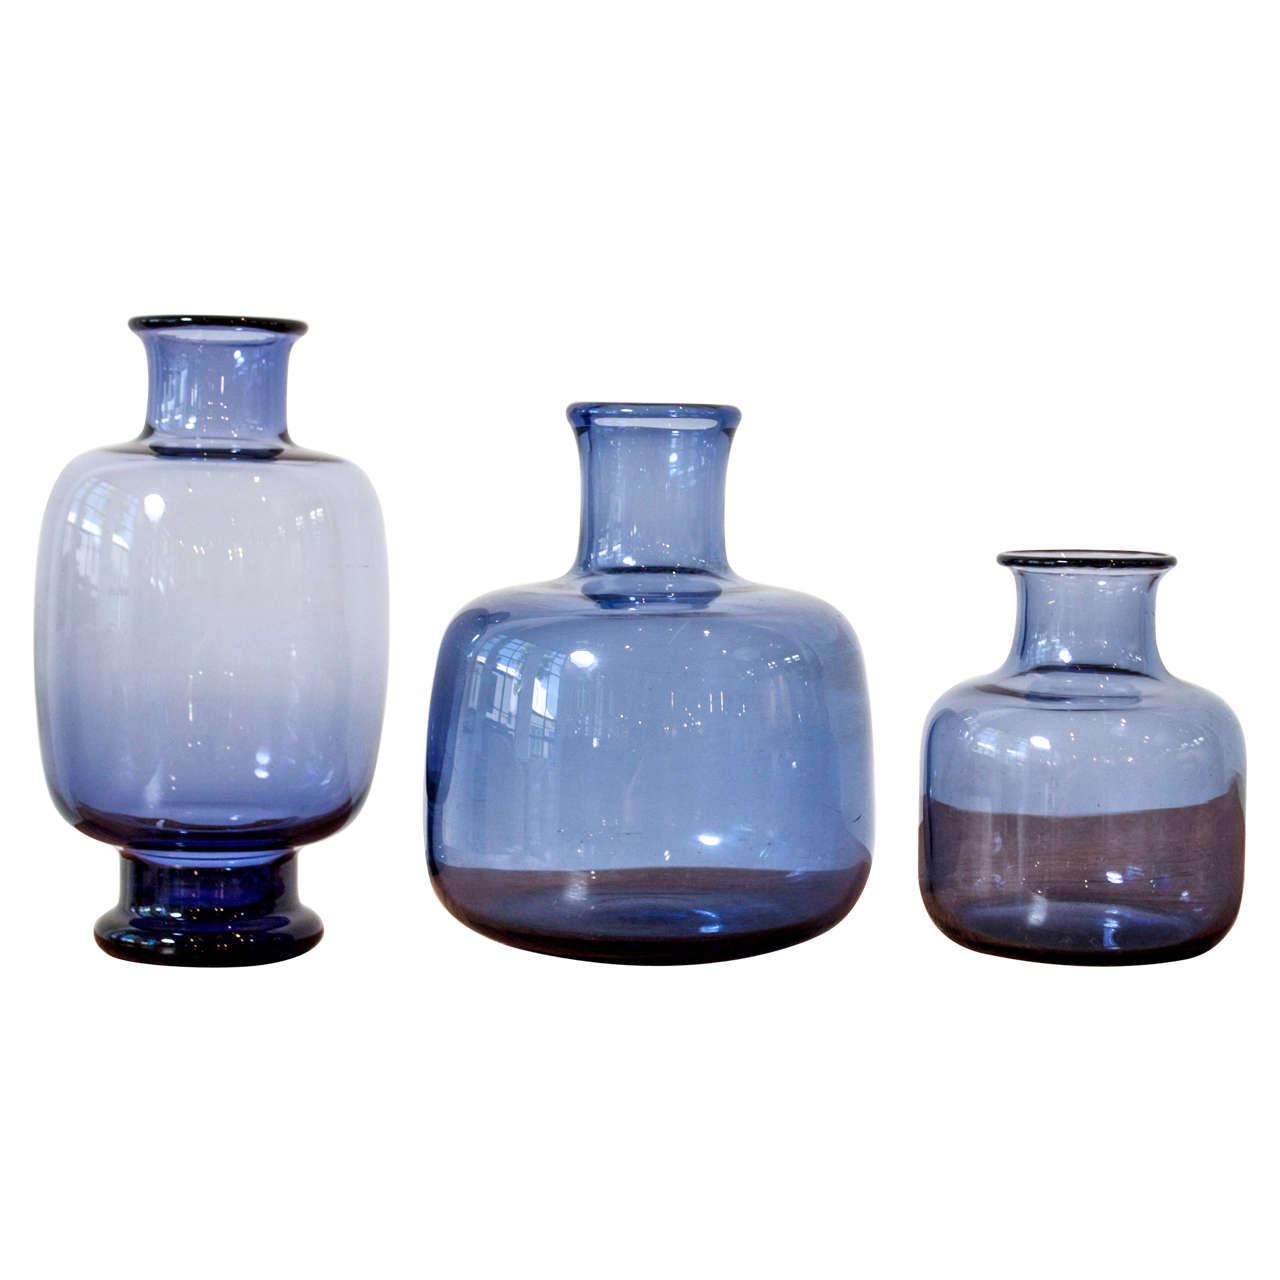 Per Lutken Three Blue Glass Vases For Sale At 1stdibs